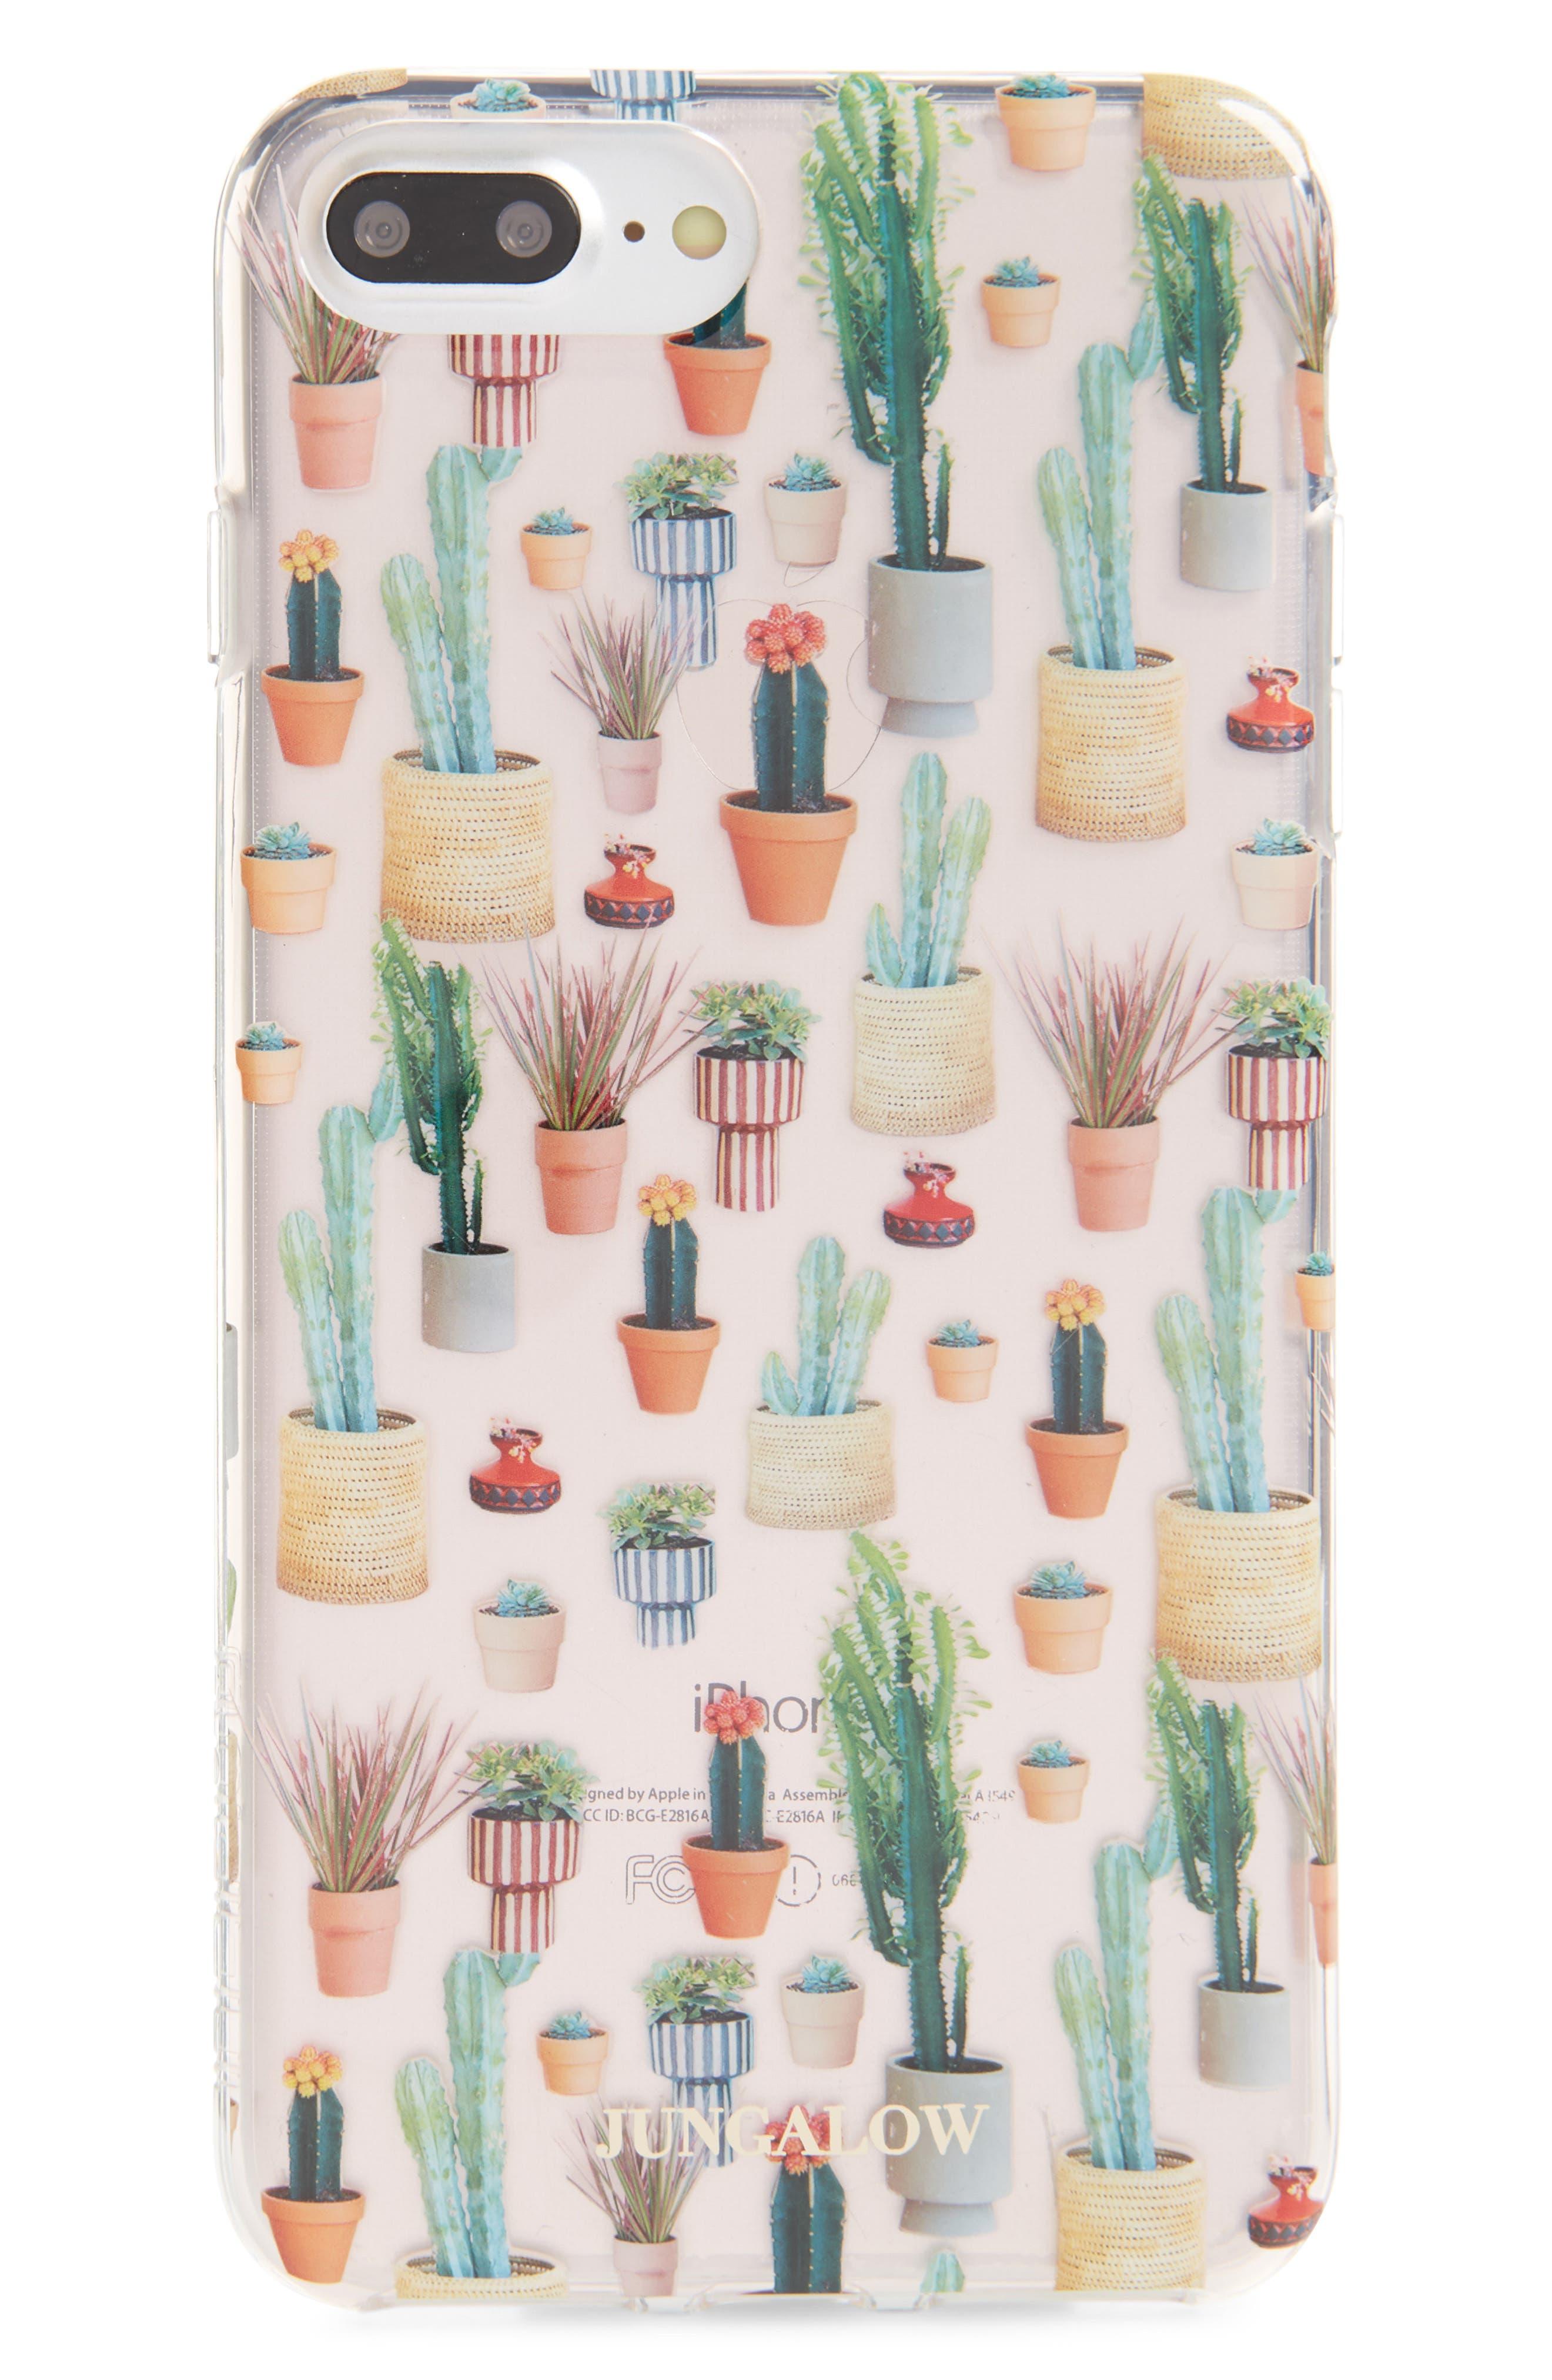 Jungalow Potted Plant iPhone 7/8 & 7/8 Plus Case,                         Main,                         color, Clear Multi